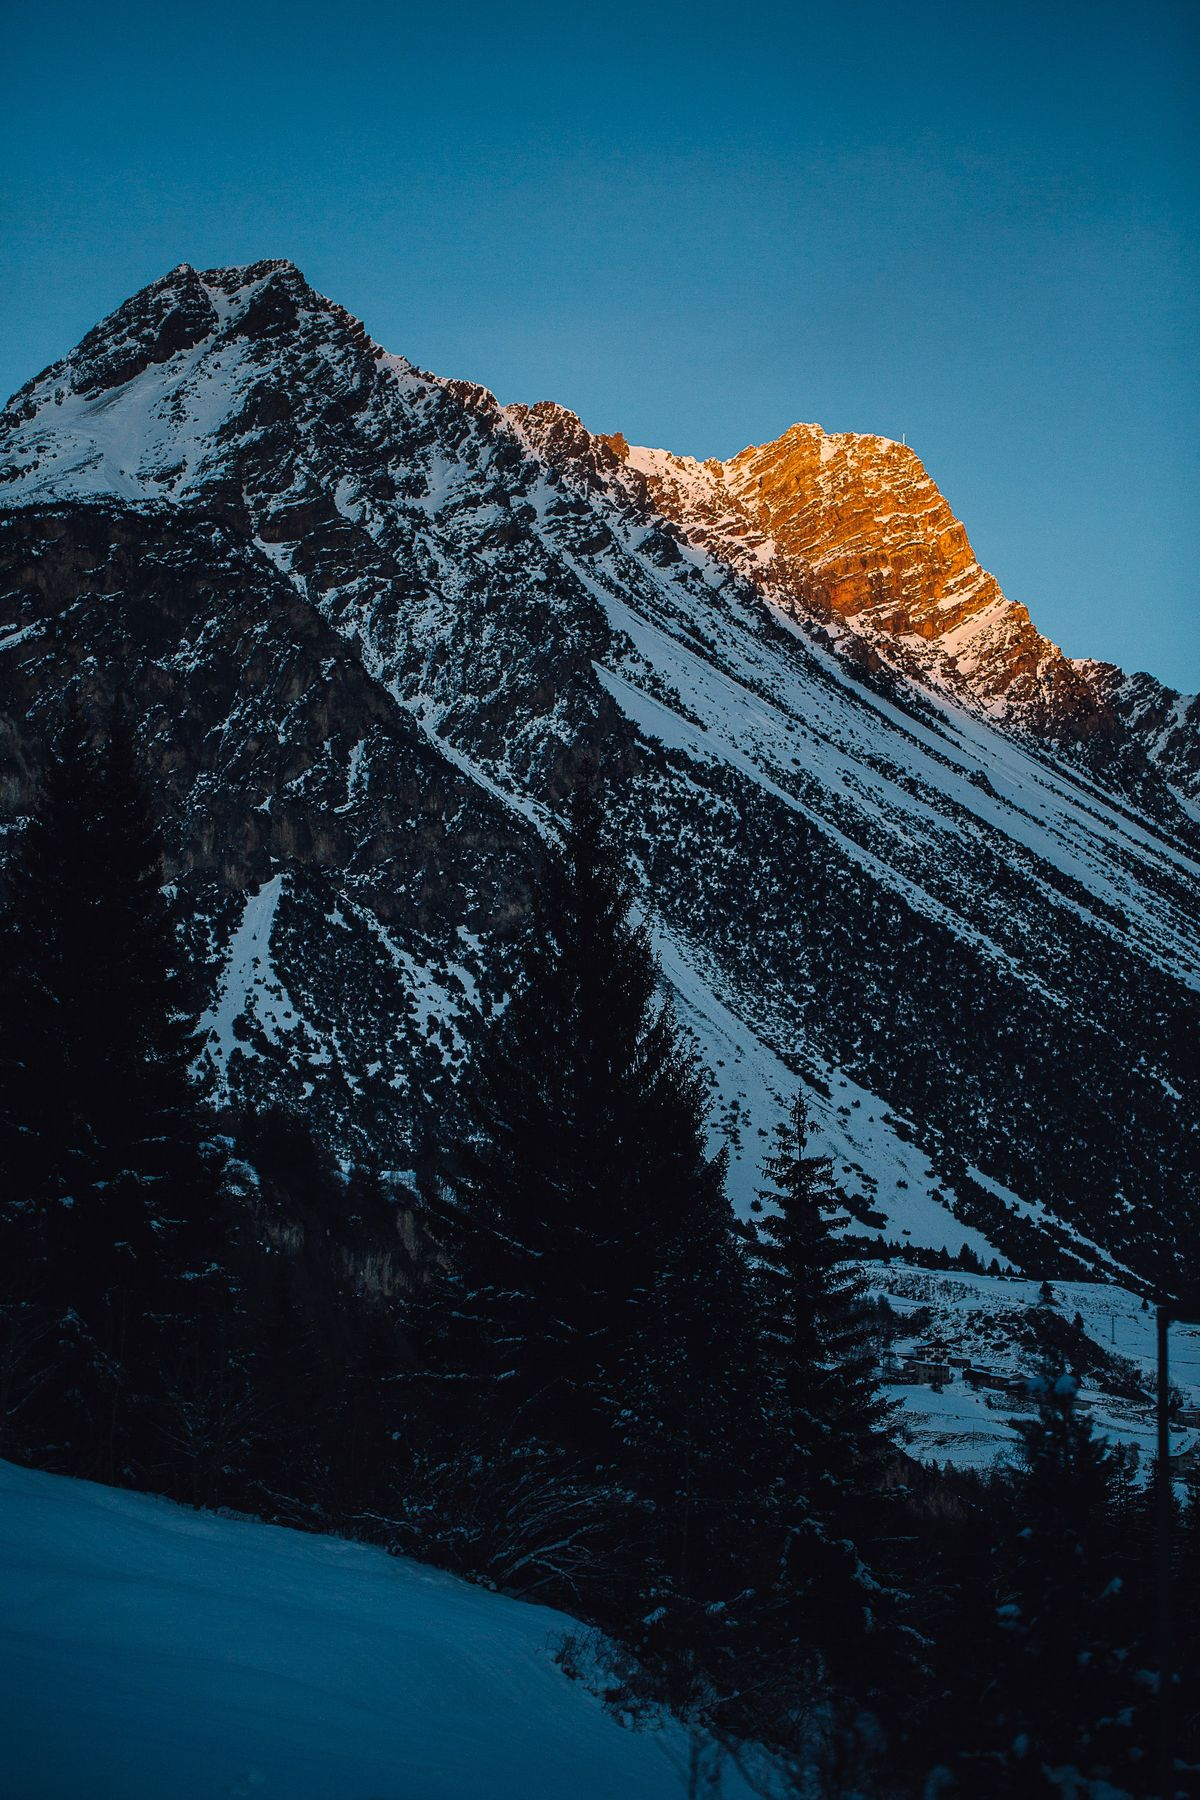 montagne lombarde